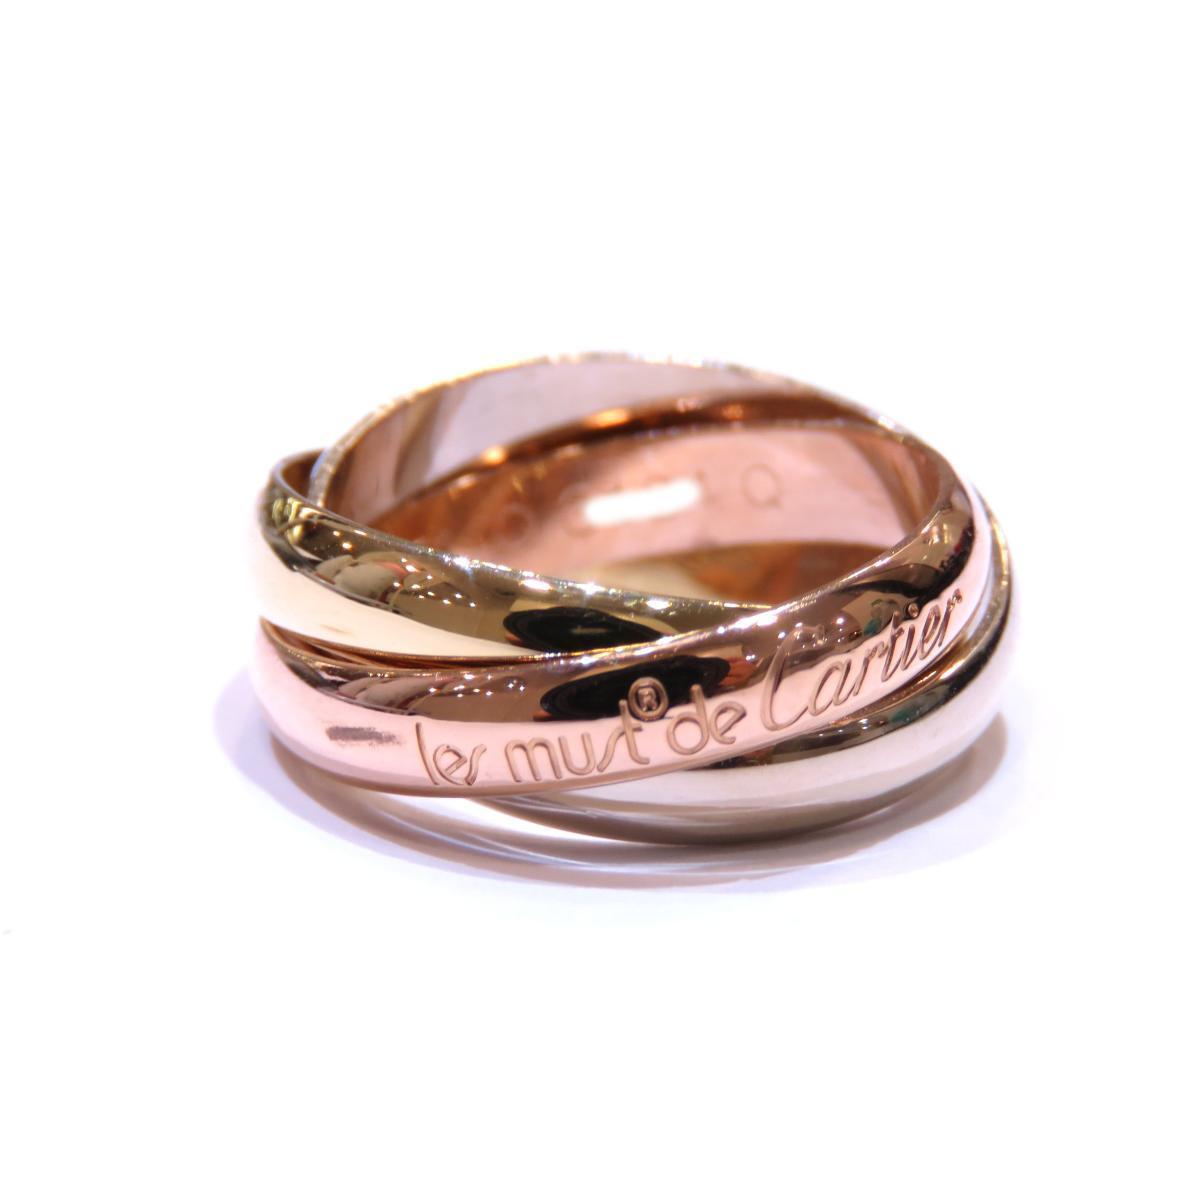 Cartier Trinity Ring Ladies K18YG (750) # 54 13.5